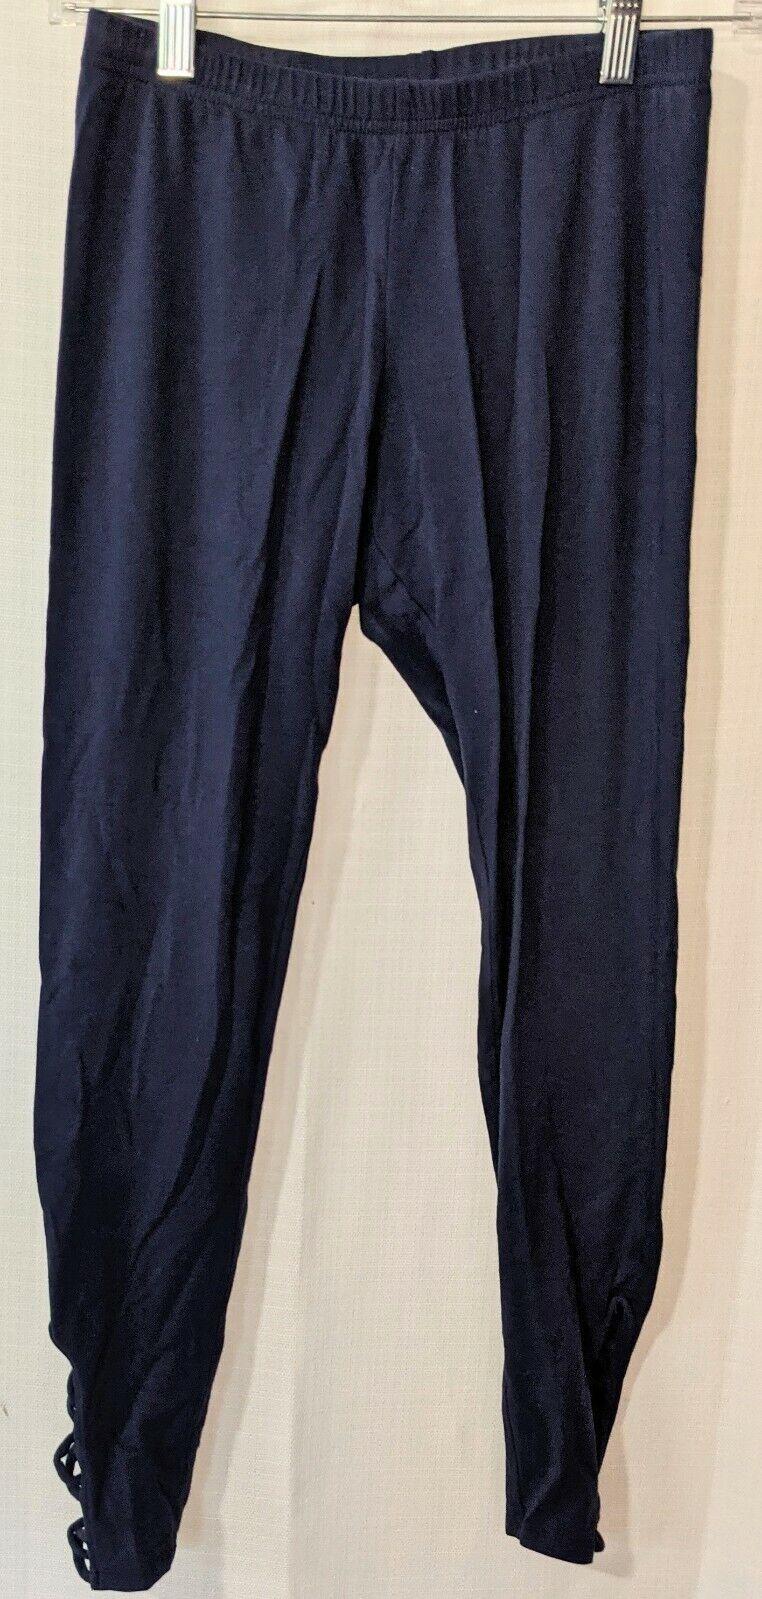 Old Navy Blue Long Leggings Ankle Cutouts Women's Size Medium